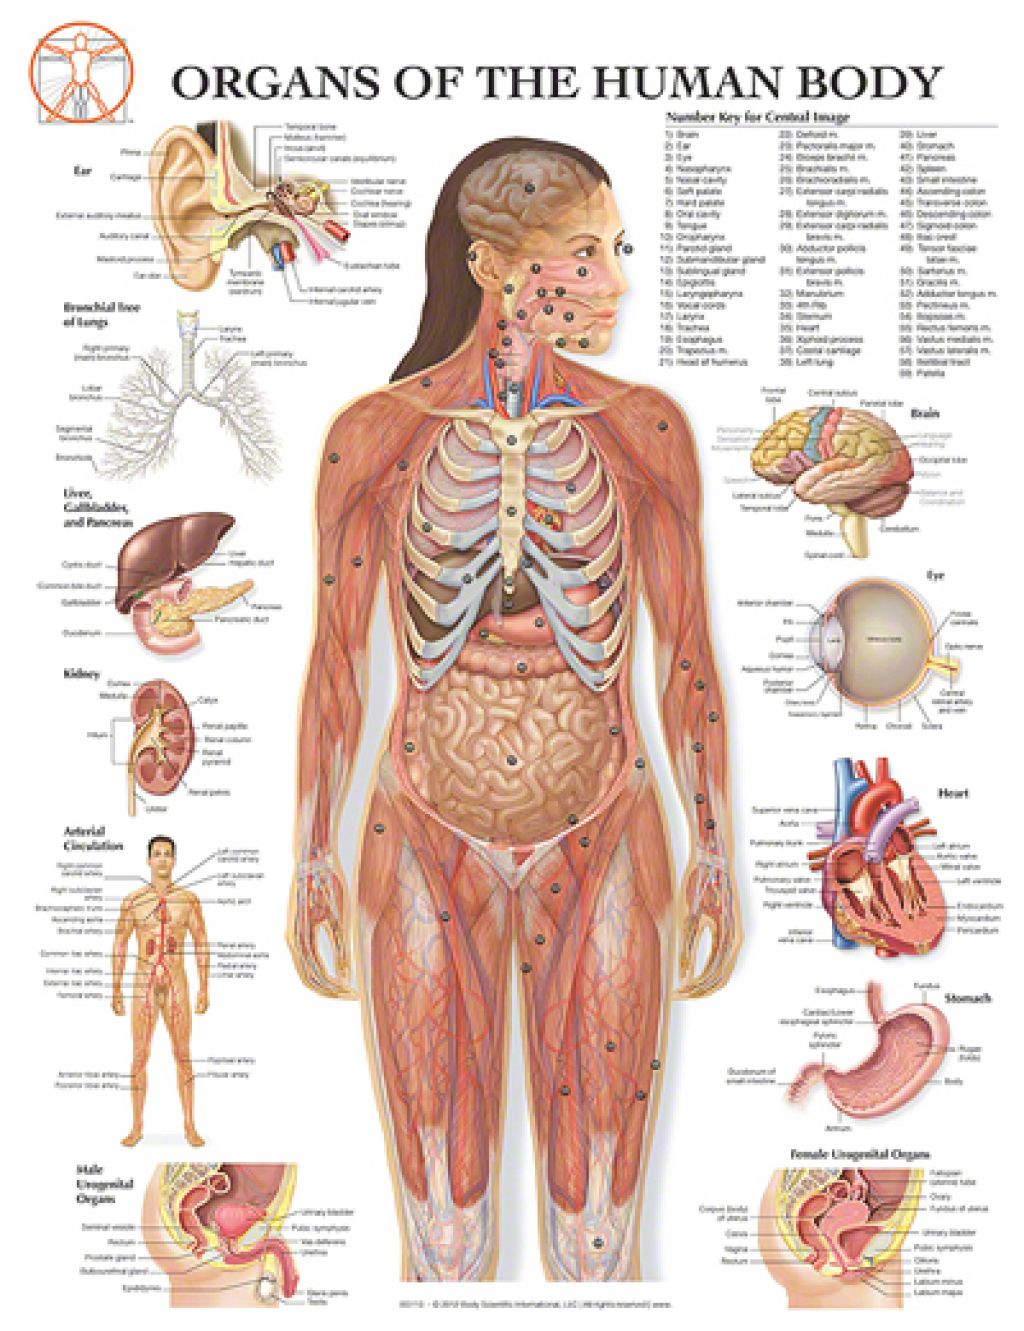 Human internal organs diagram clipart graphic freeuse stock Free Human Body Organs, Download Free Clip Art, Free Clip Art on ... graphic freeuse stock